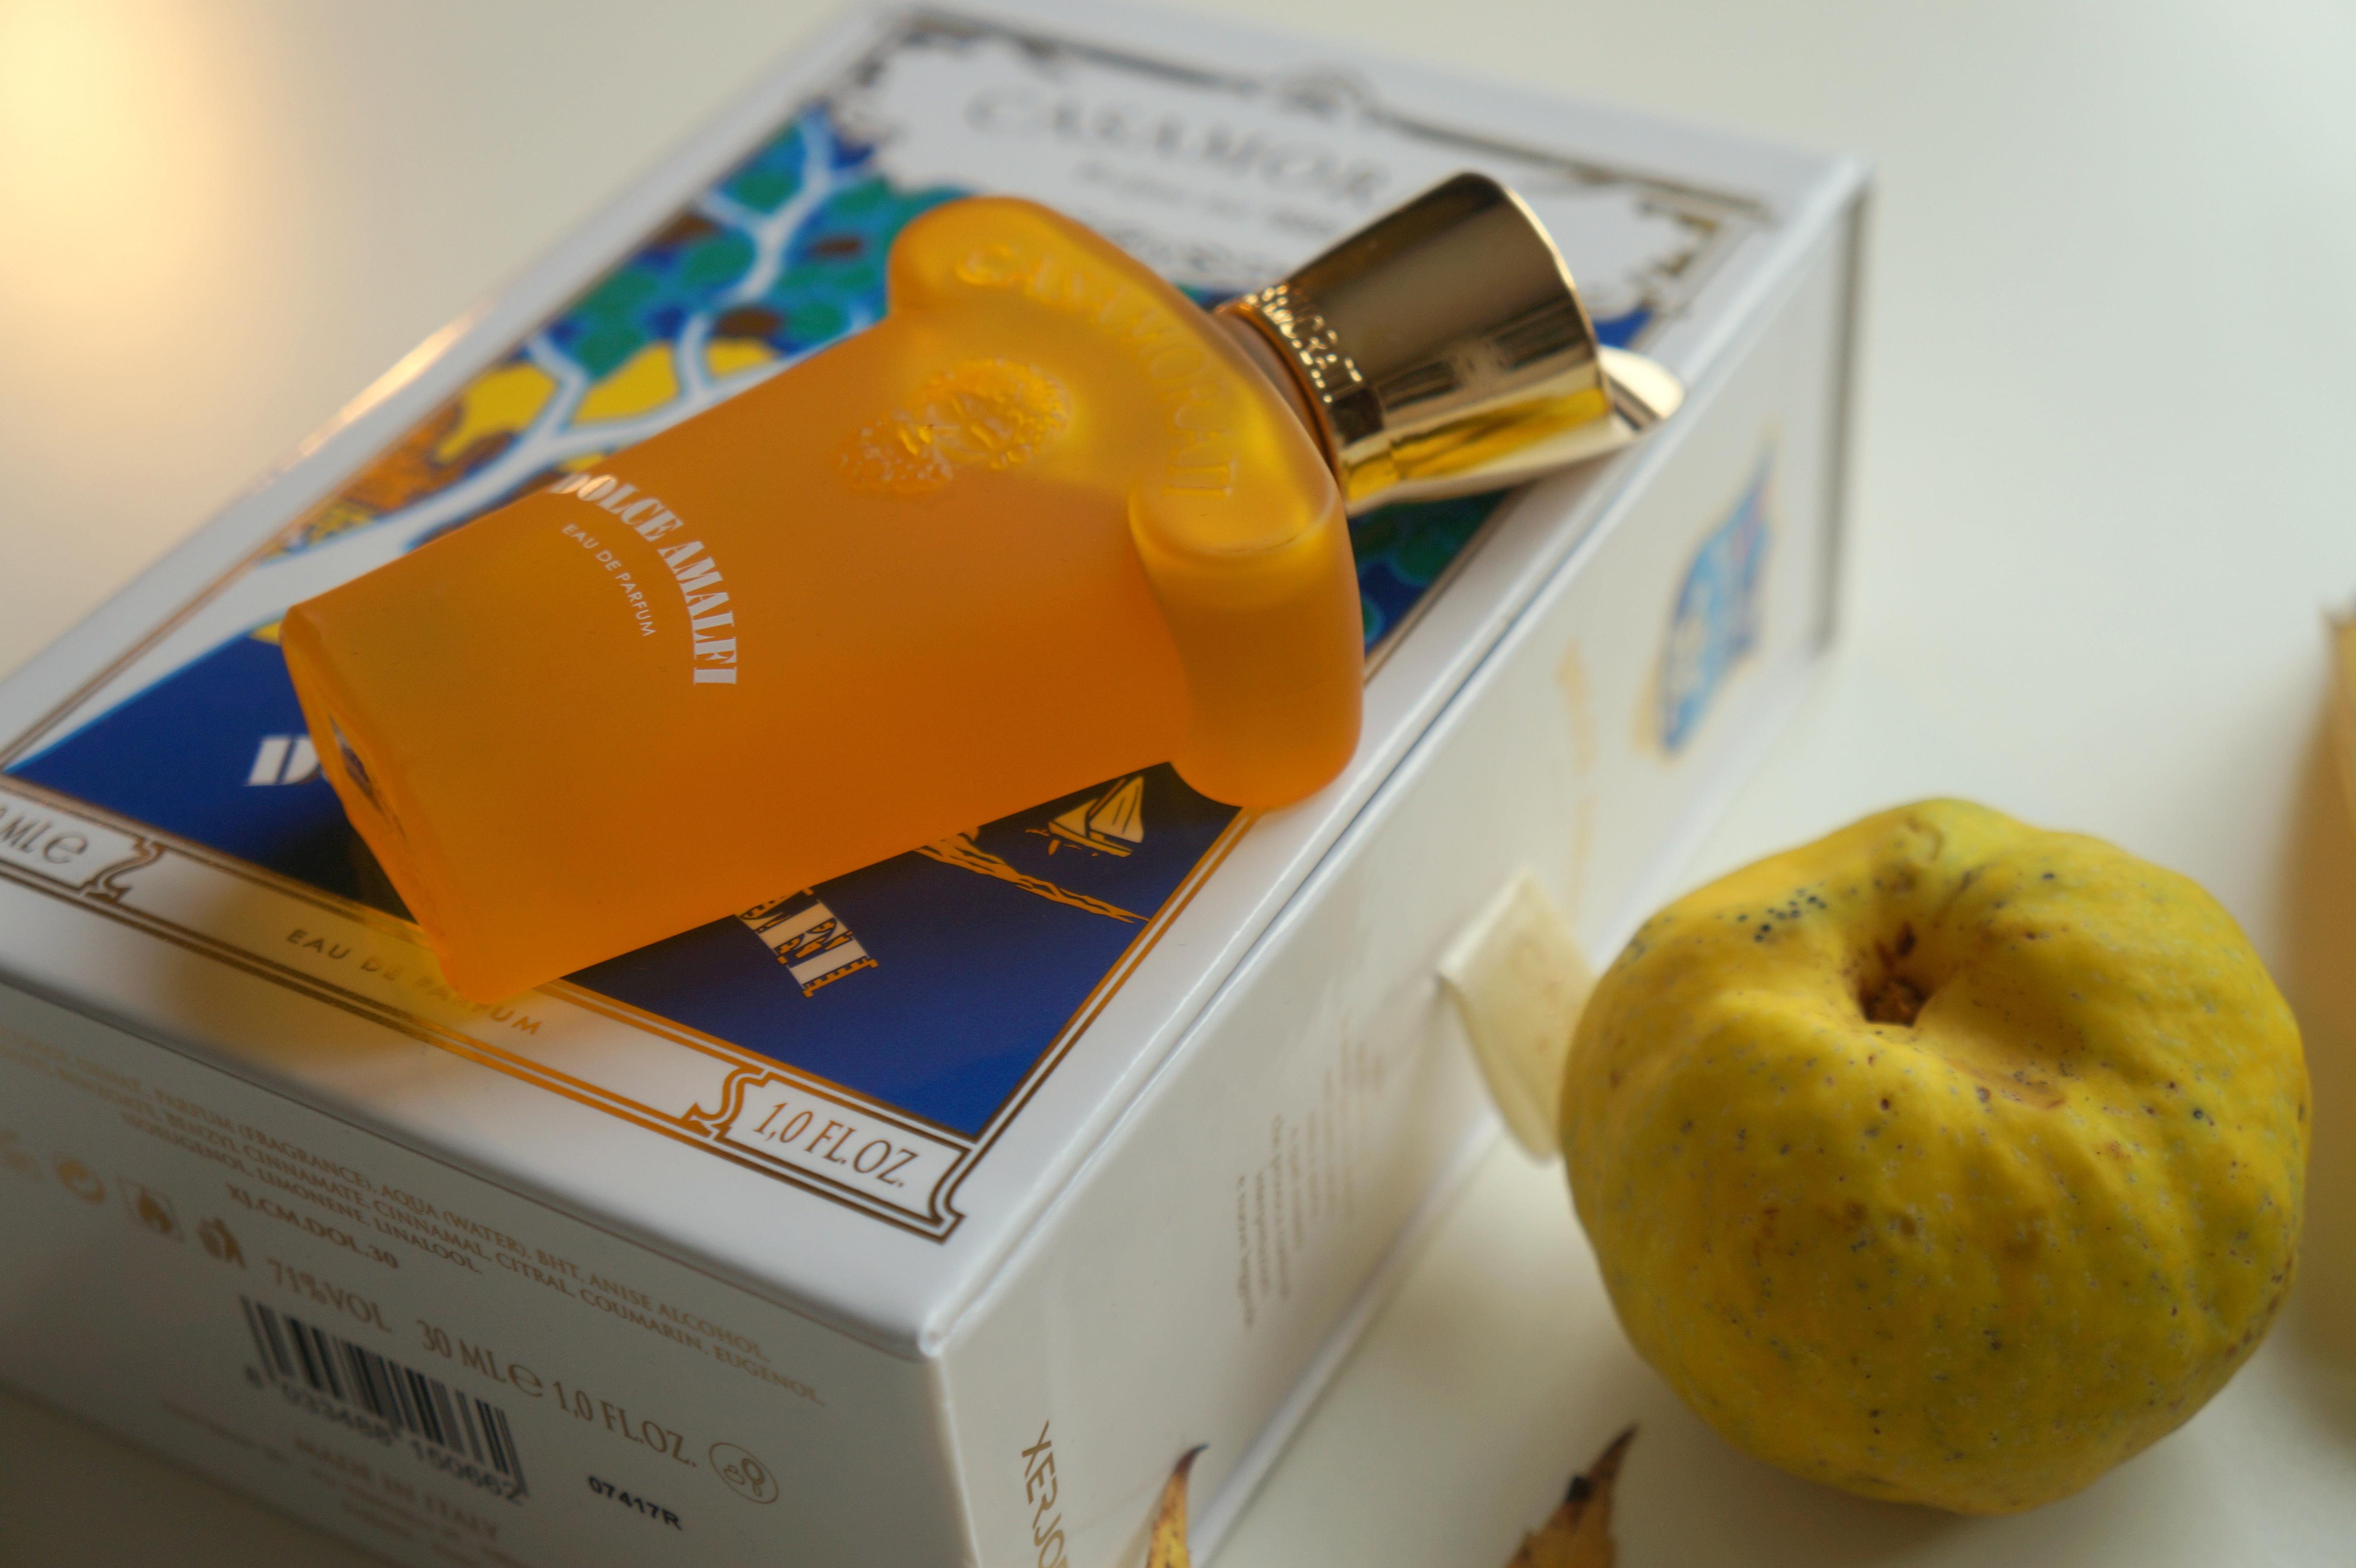 xerjoff dolce amalfi